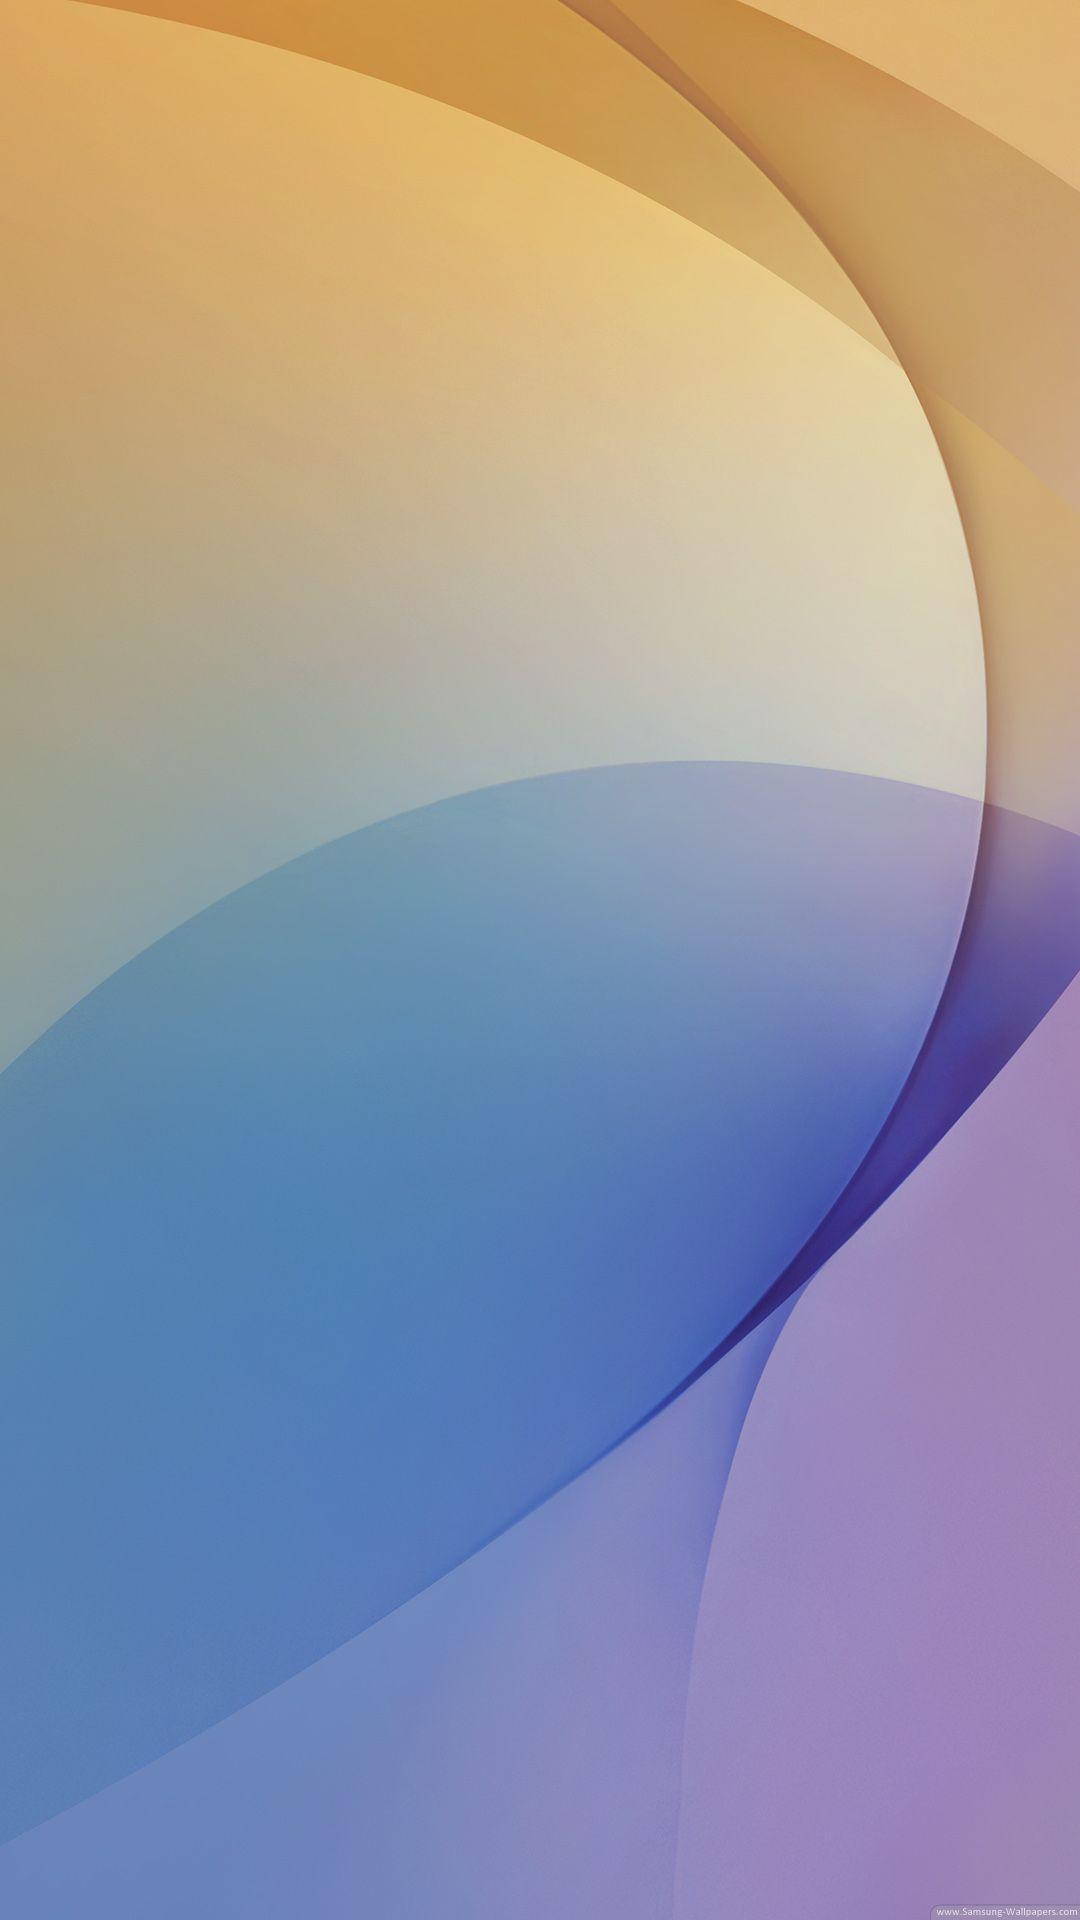 Samsung Galaxy J7 Wallpapers Top Free Samsung Galaxy J7